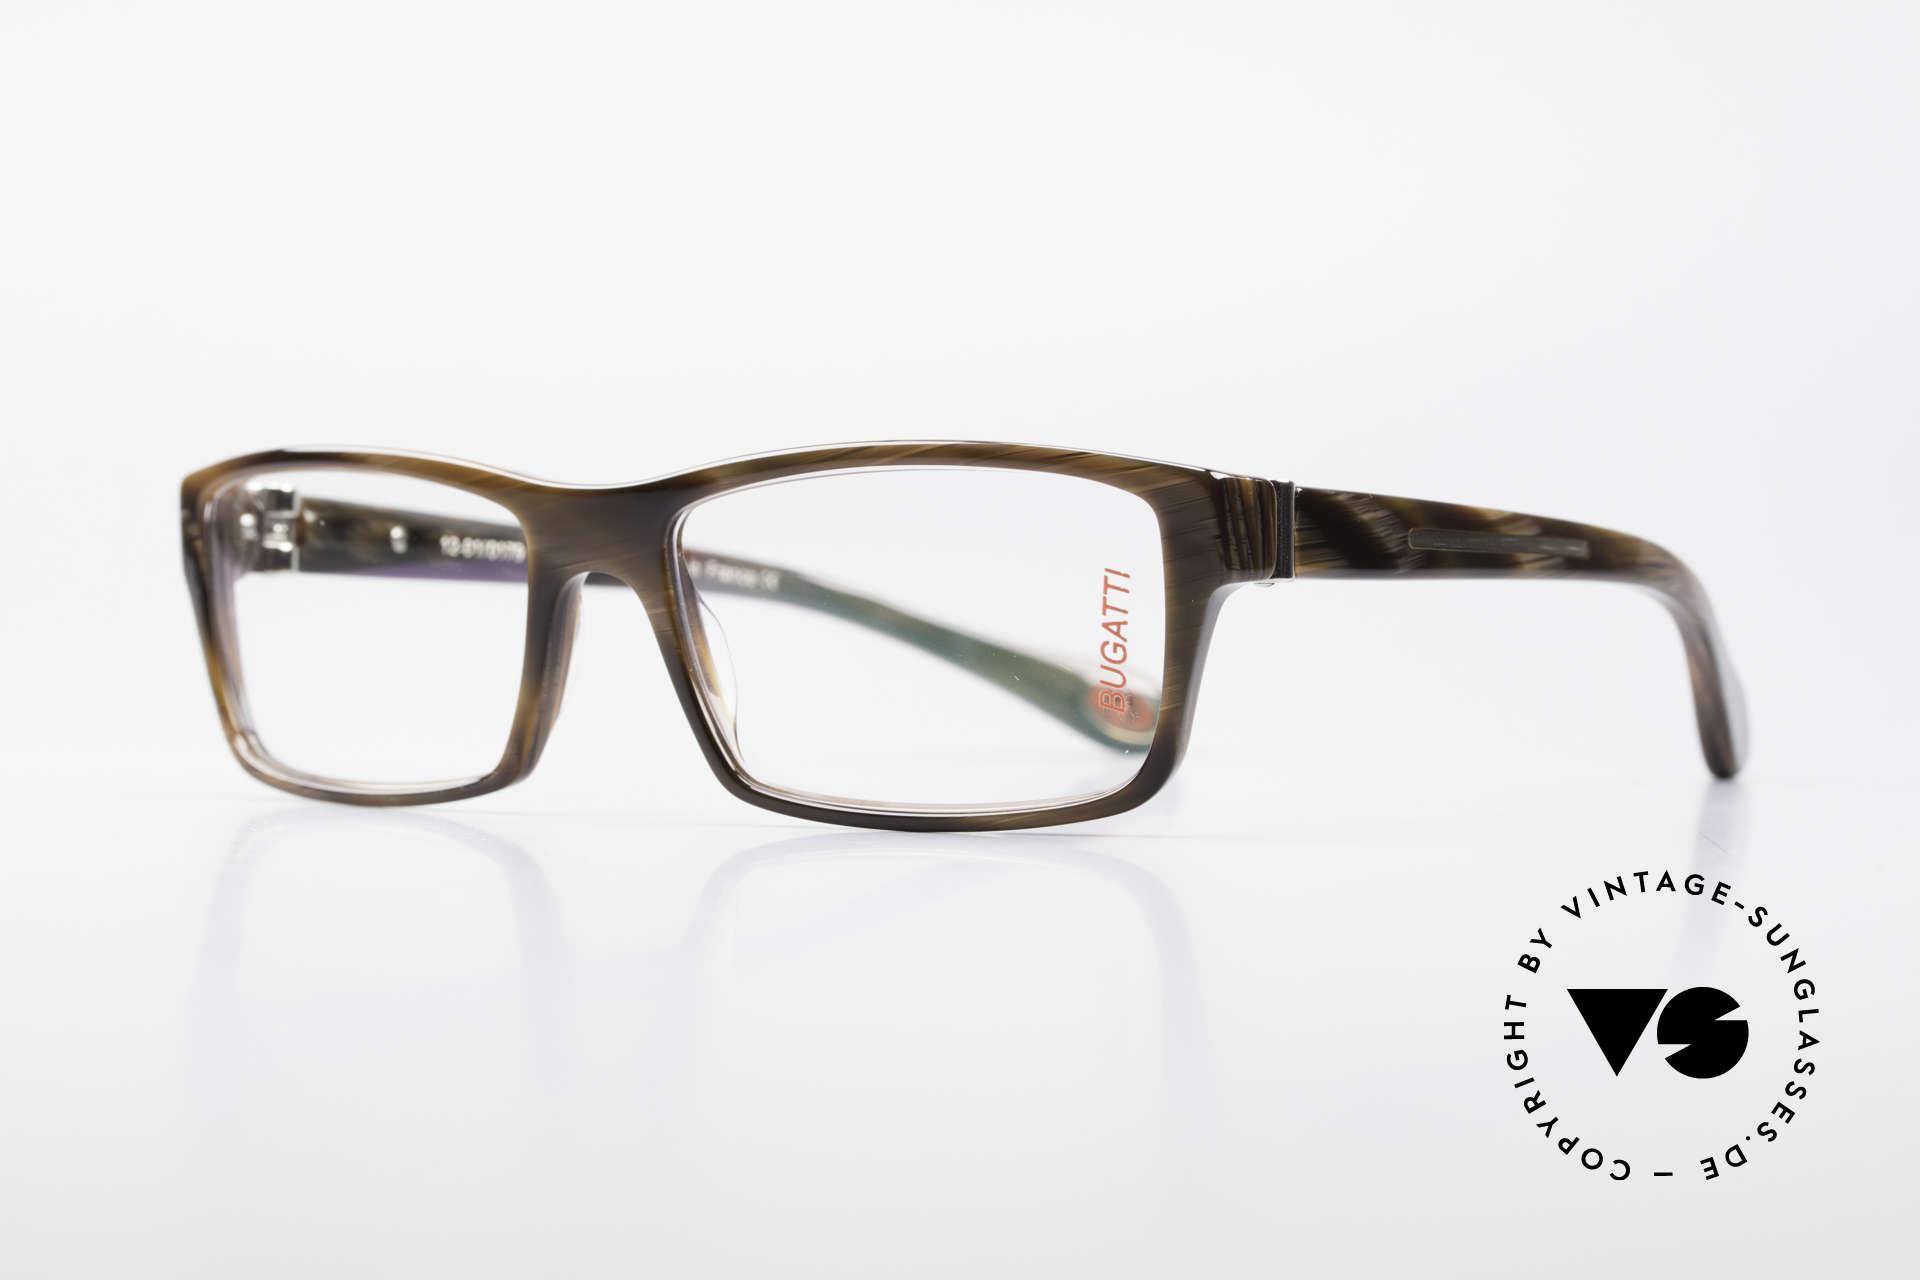 Bugatti 487 Striking Designer Glasses Men, 1. class wearing comfort due to spring hinges, Made for Men